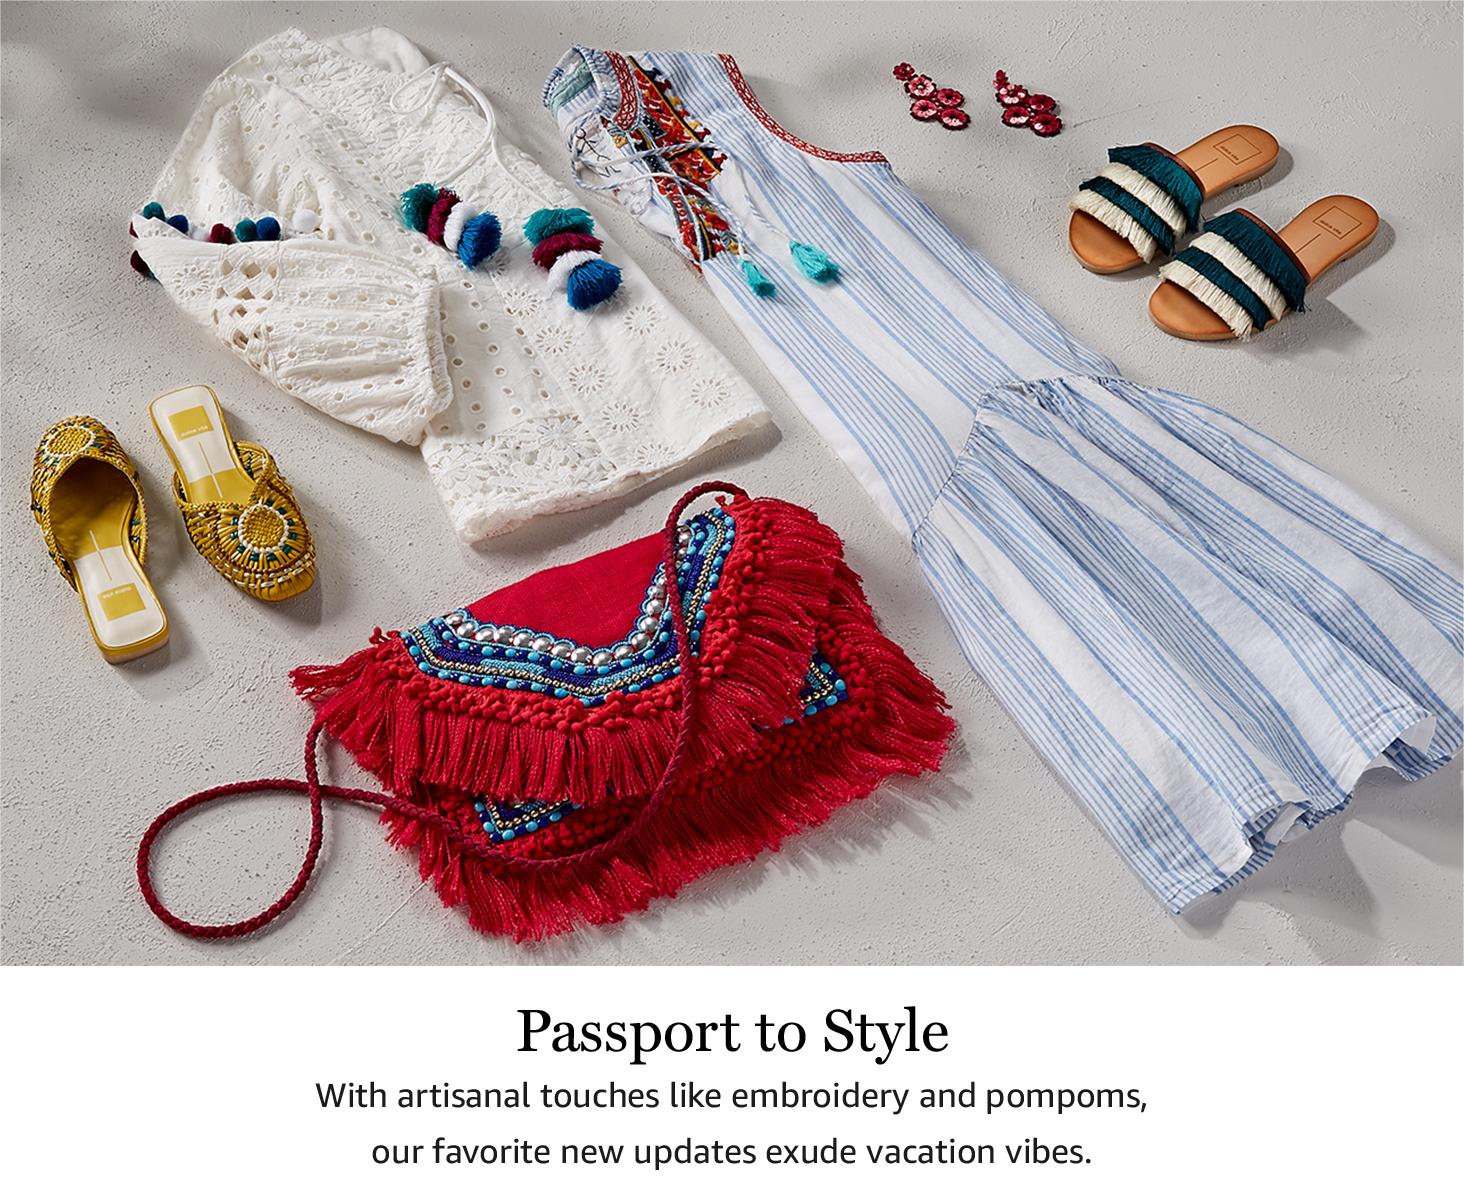 Passport to Style